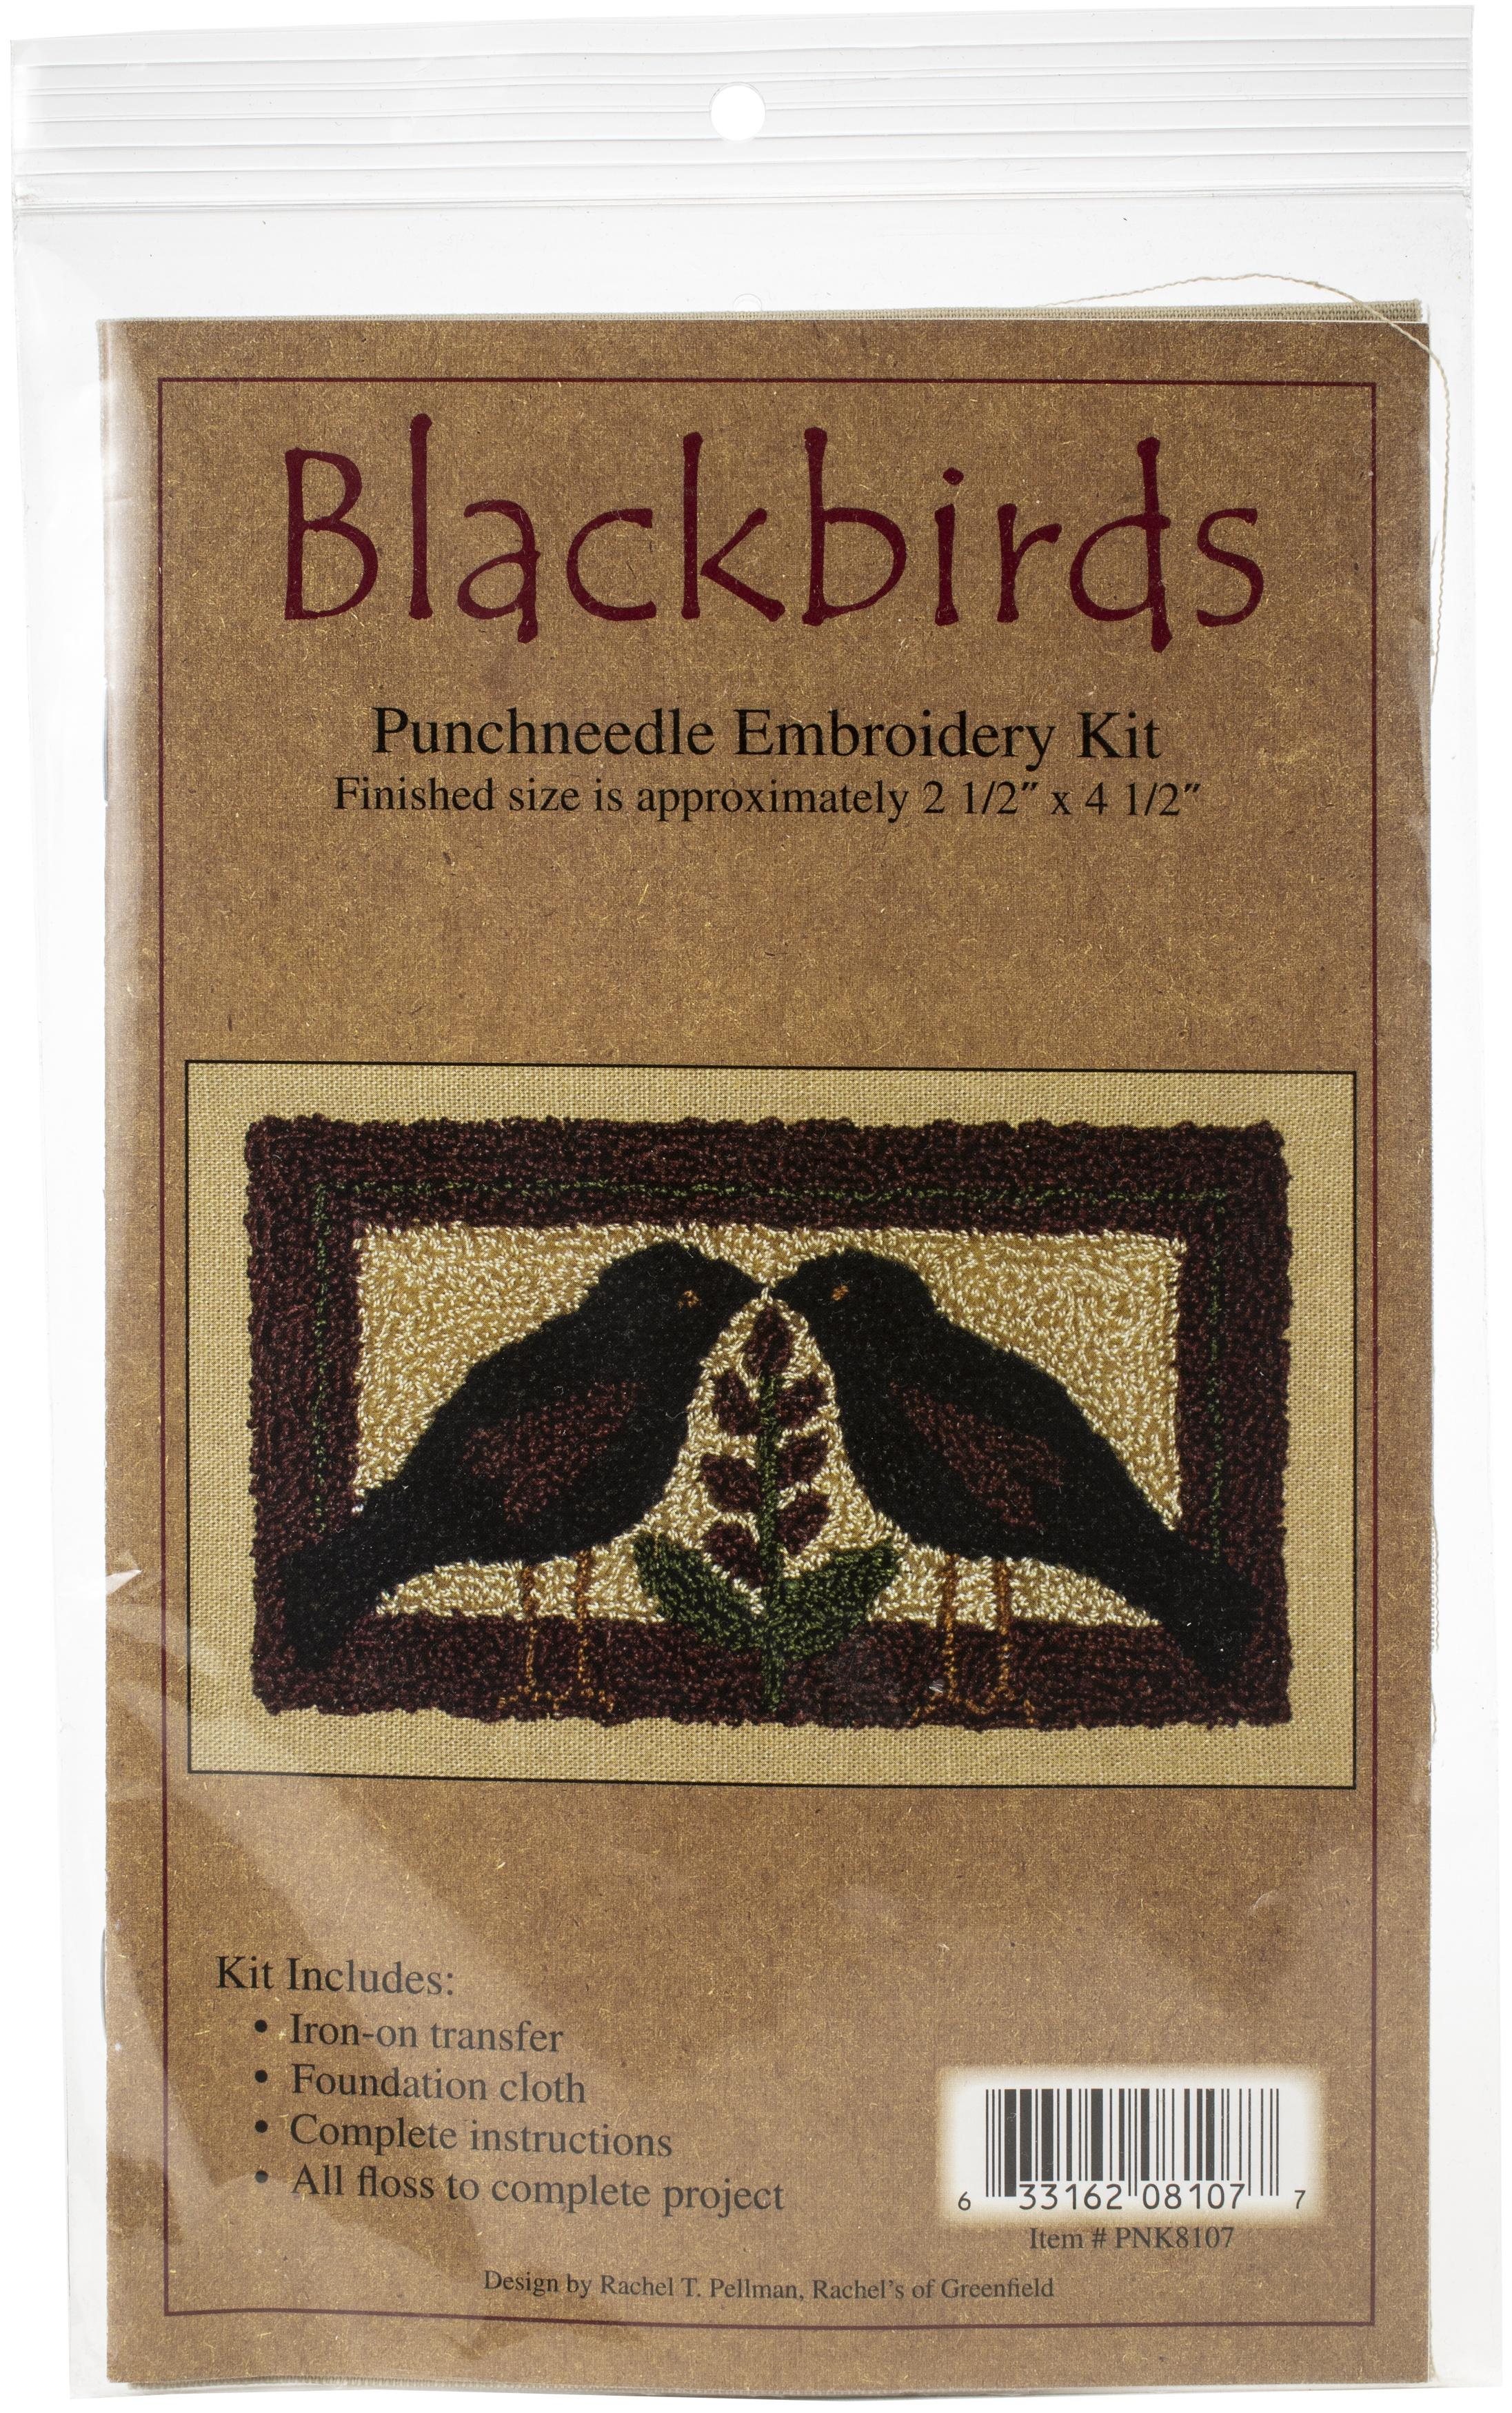 Blackbirds Punchneedle